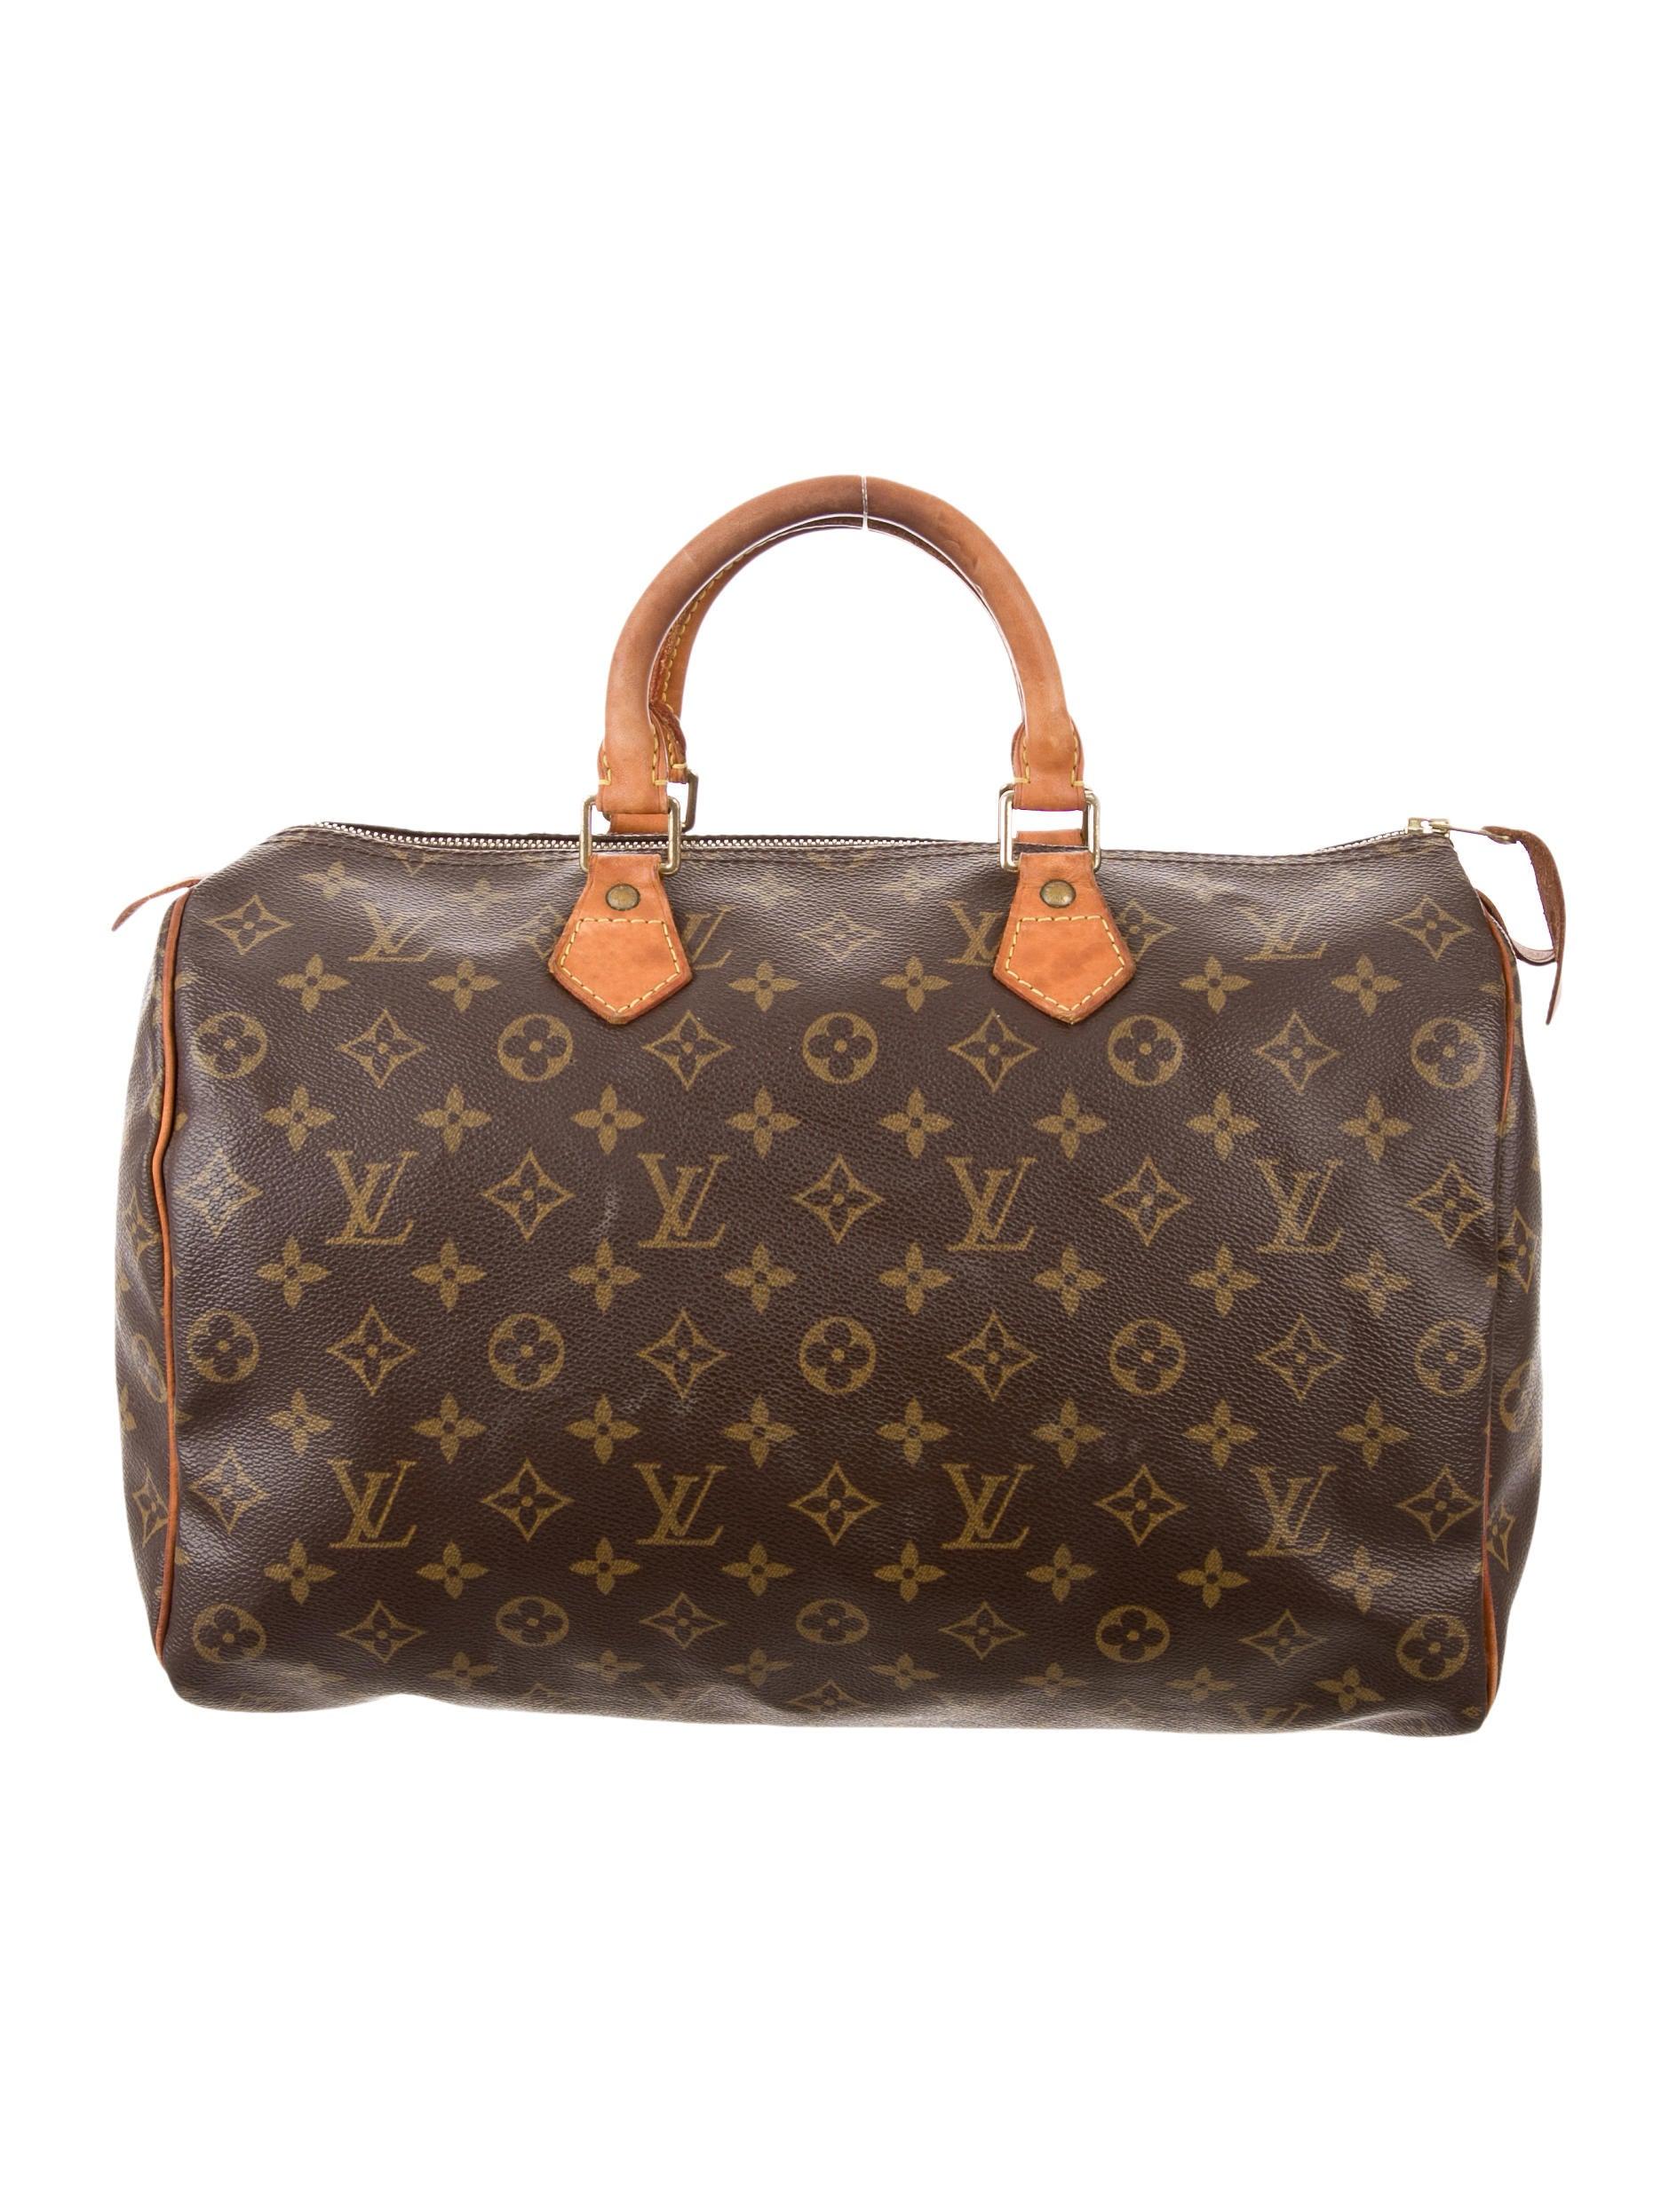 louis vuitton monogram speedy 35 handbags lou125057. Black Bedroom Furniture Sets. Home Design Ideas